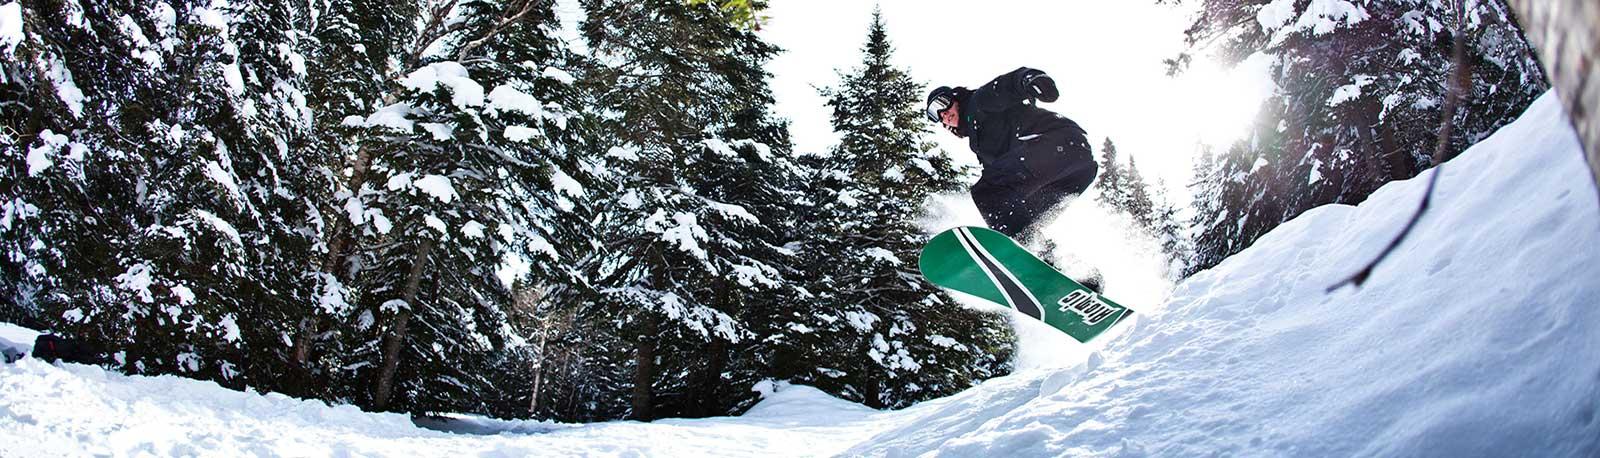 Mont Saint Anne School Ski Trips